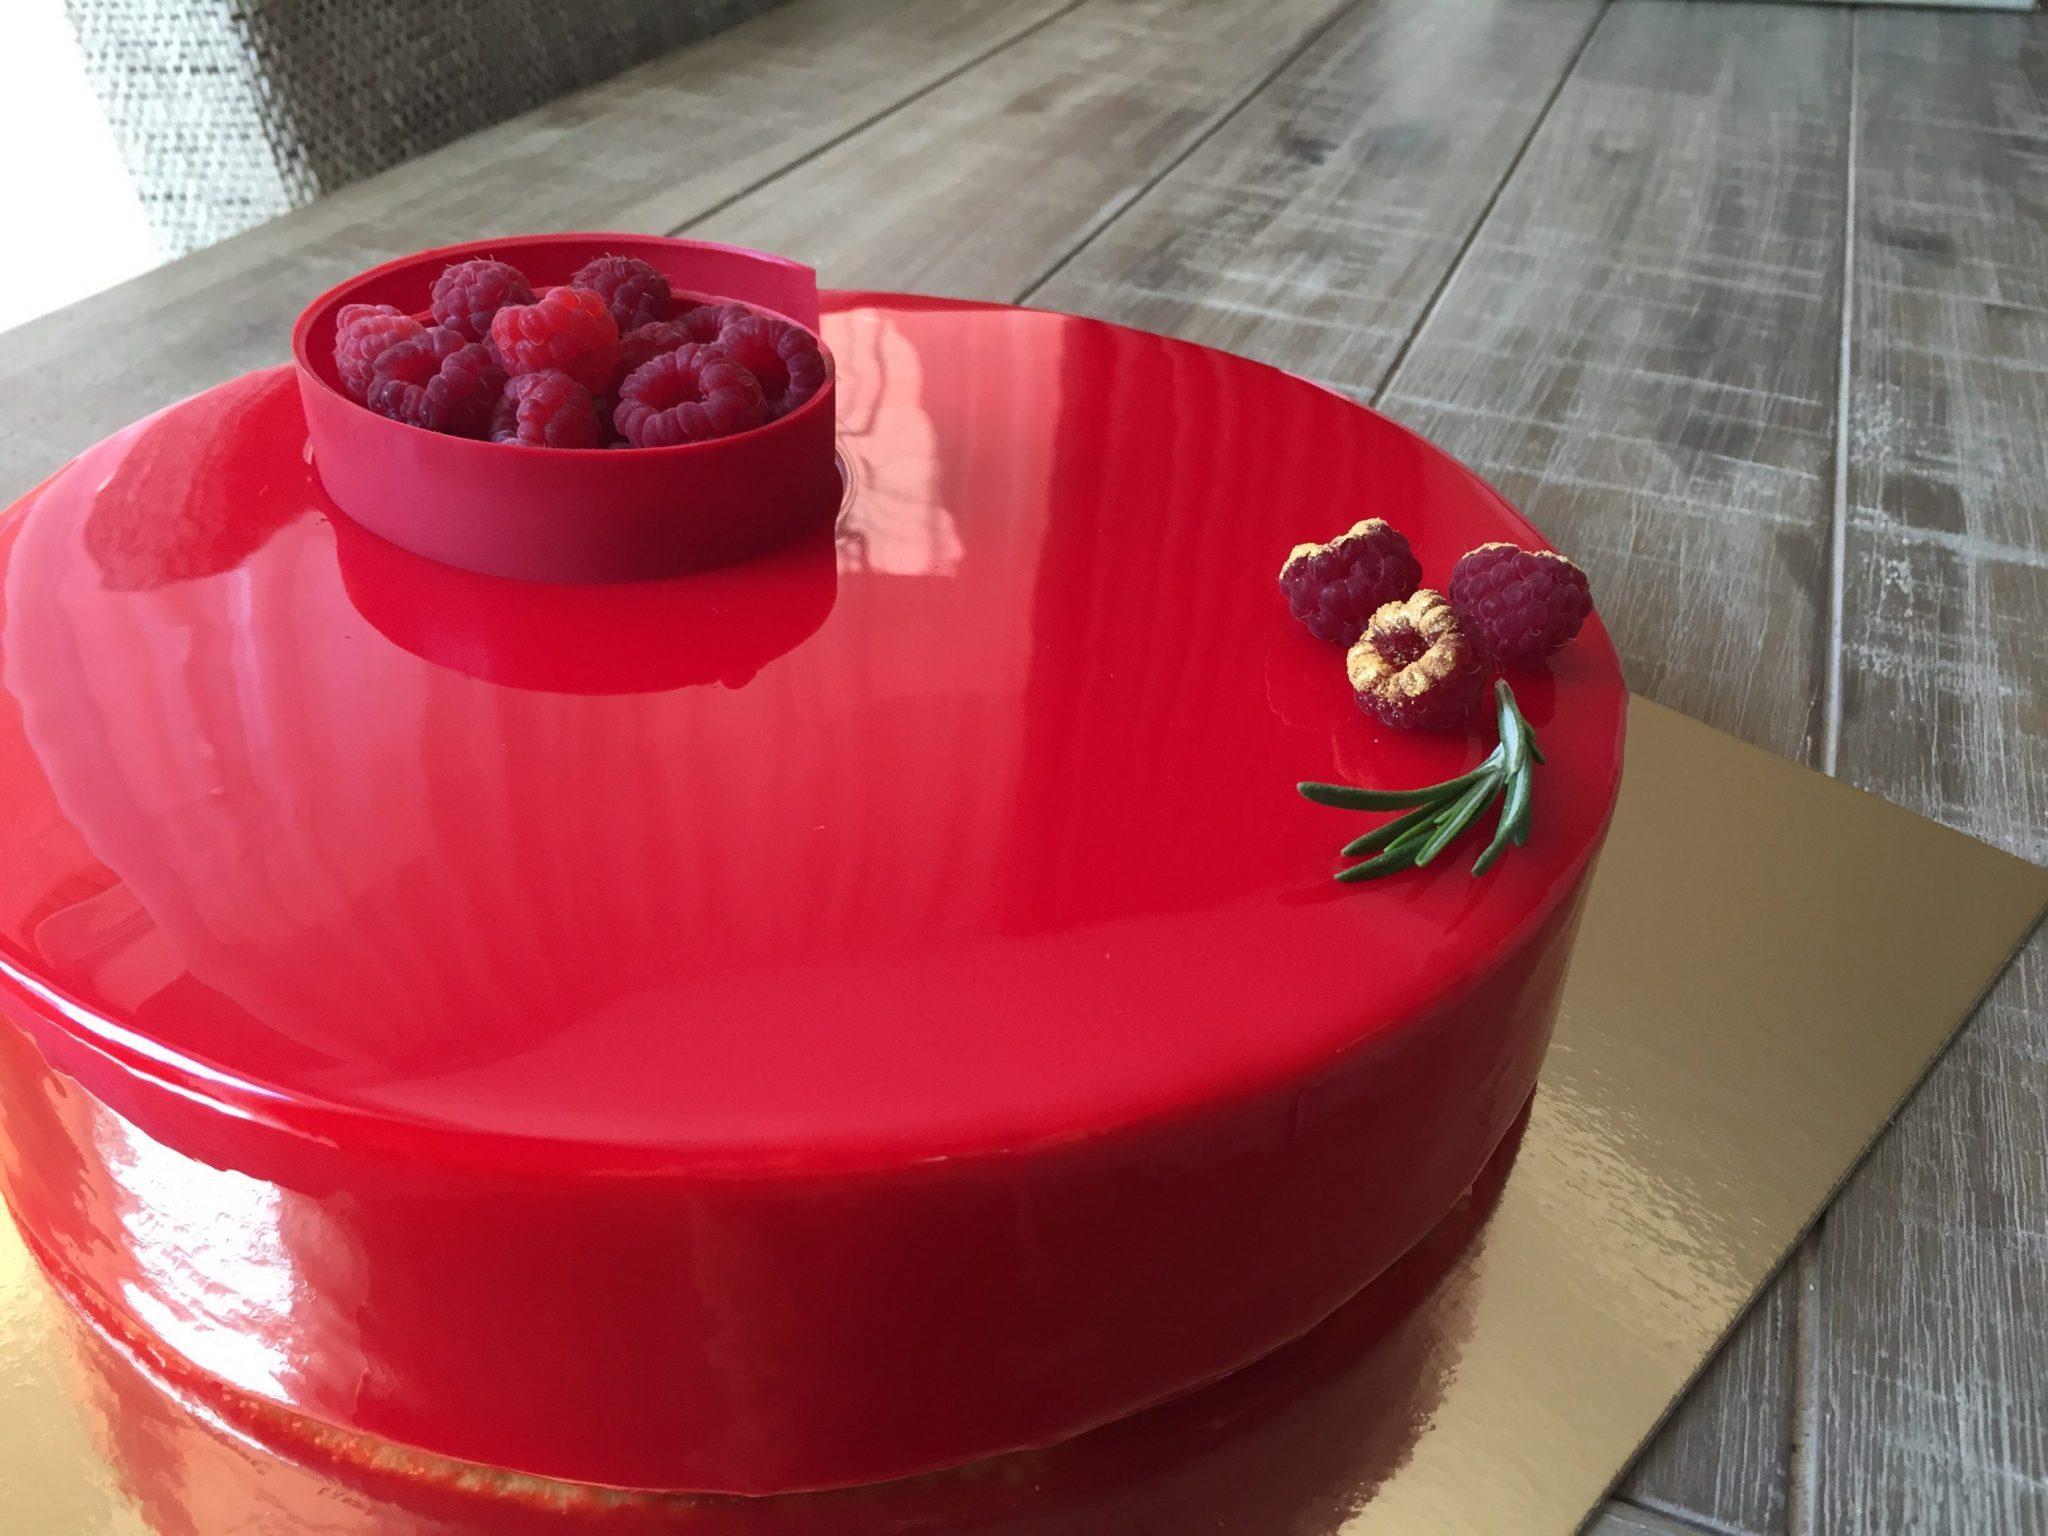 Гляссаж для торта рецепт пошагово